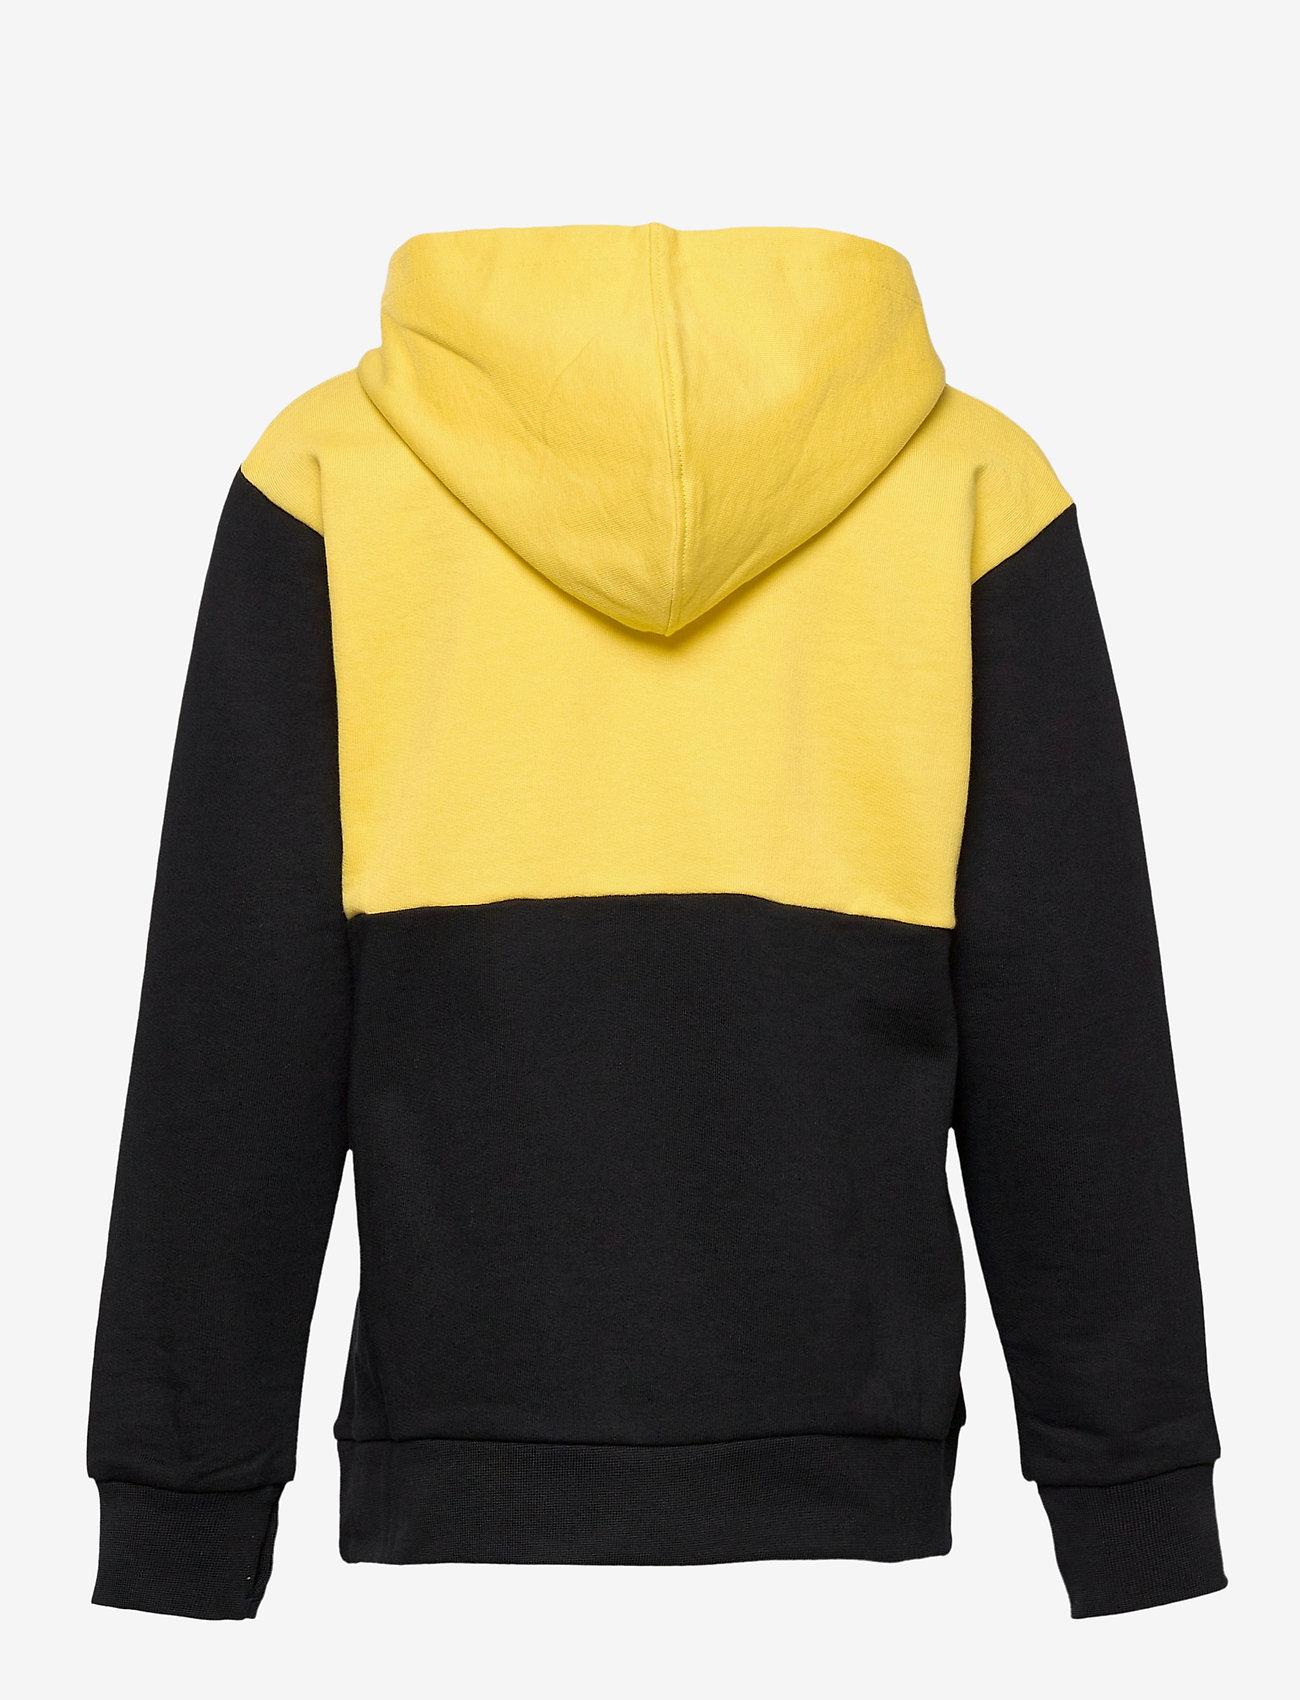 Hummel - hmlMORTEN HOODIE - hoodies - maize - 1